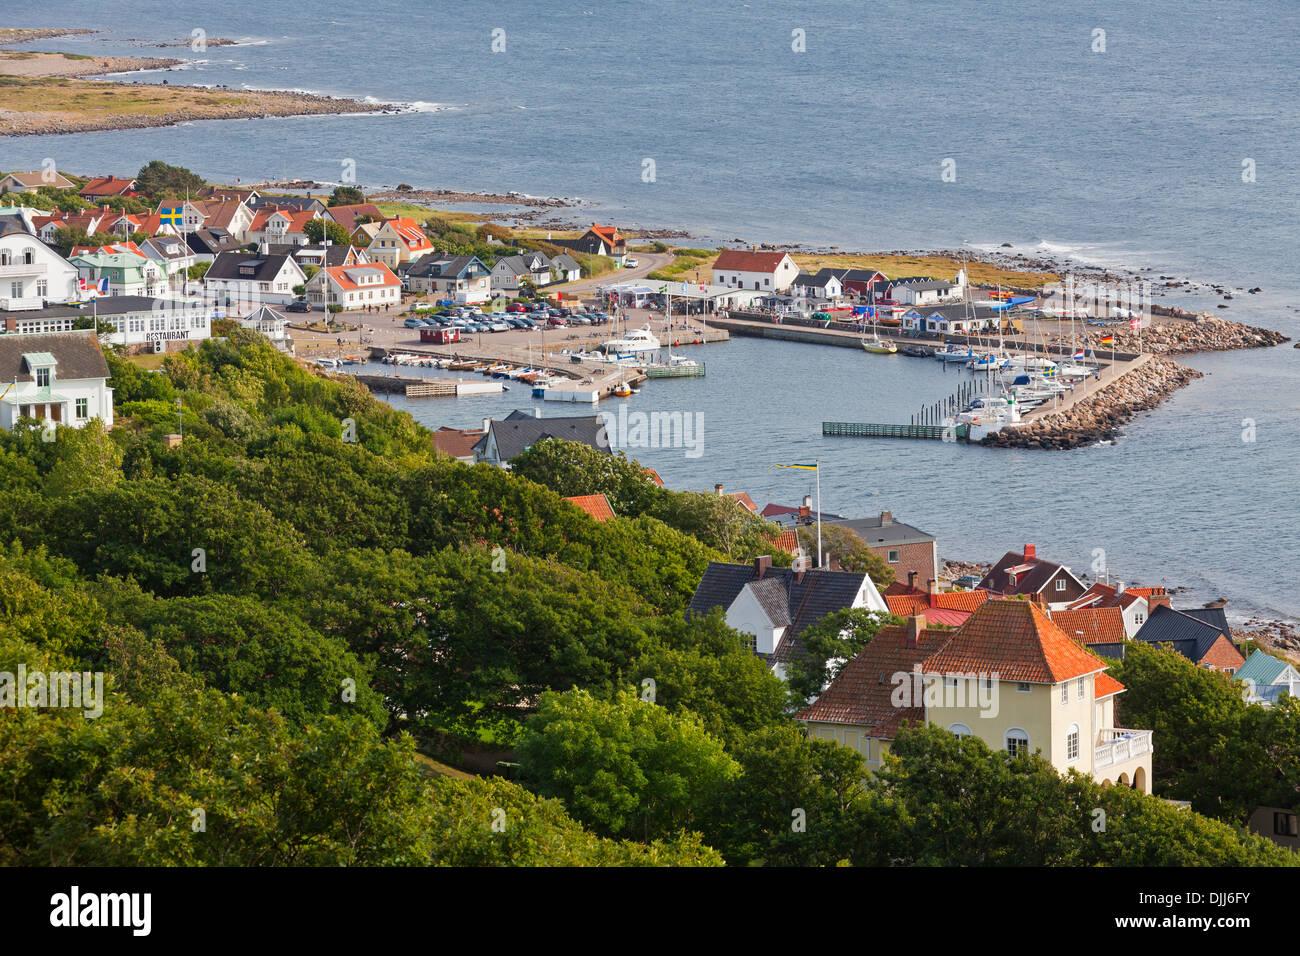 View over the harbour at Mölle in the Kattegat Strait, Skåne / Scania, Sweden, Scandinavia - Stock Image